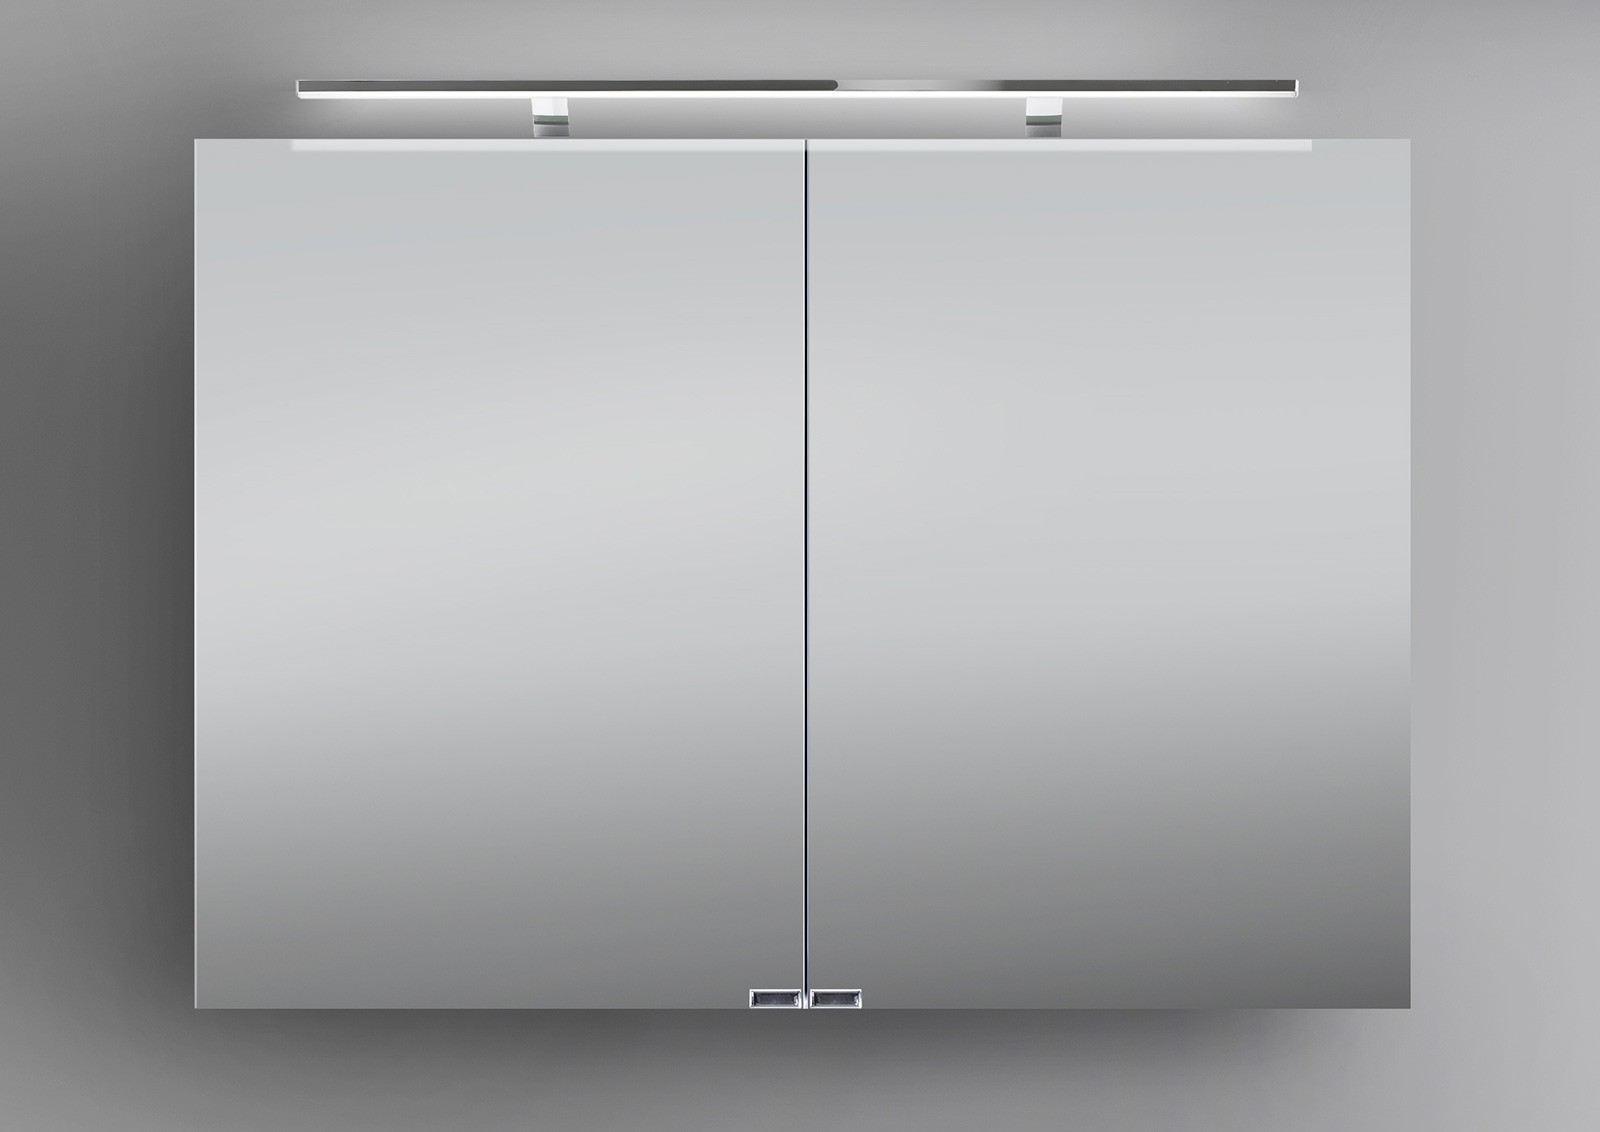 Spiegelschrank bad 100 cm led beleuchtung doppelseitig for Design spiegelschrank bad